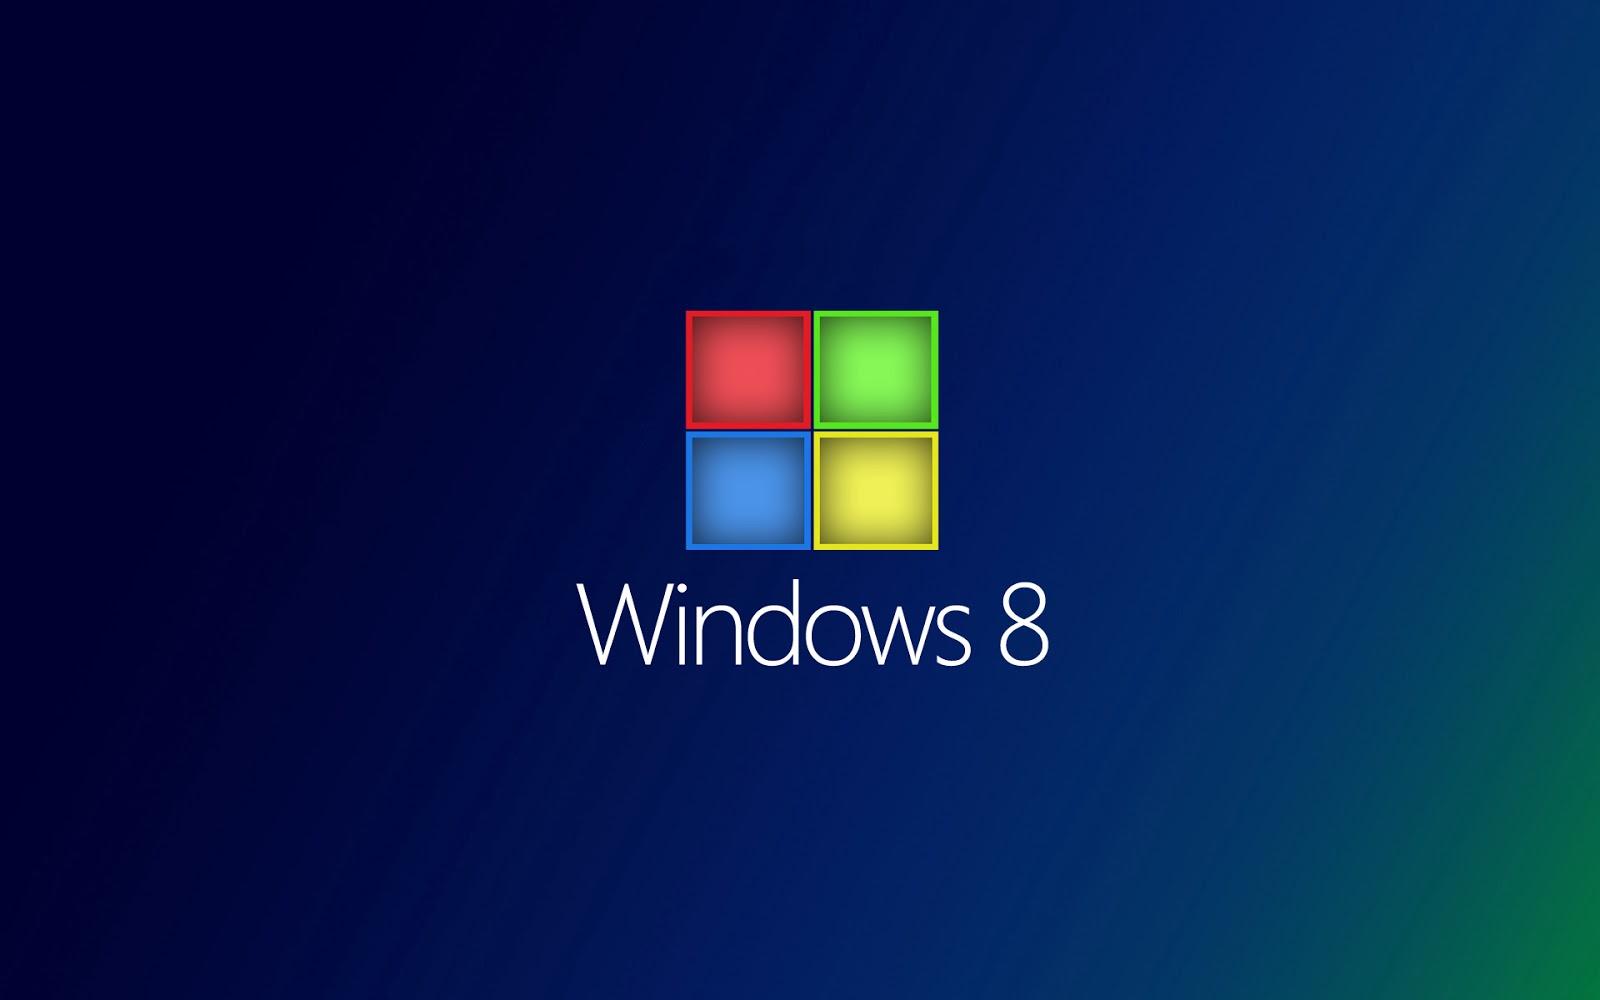 Windows 8 Wallpapers Release: HD Wallpapers 1080p Windows 8